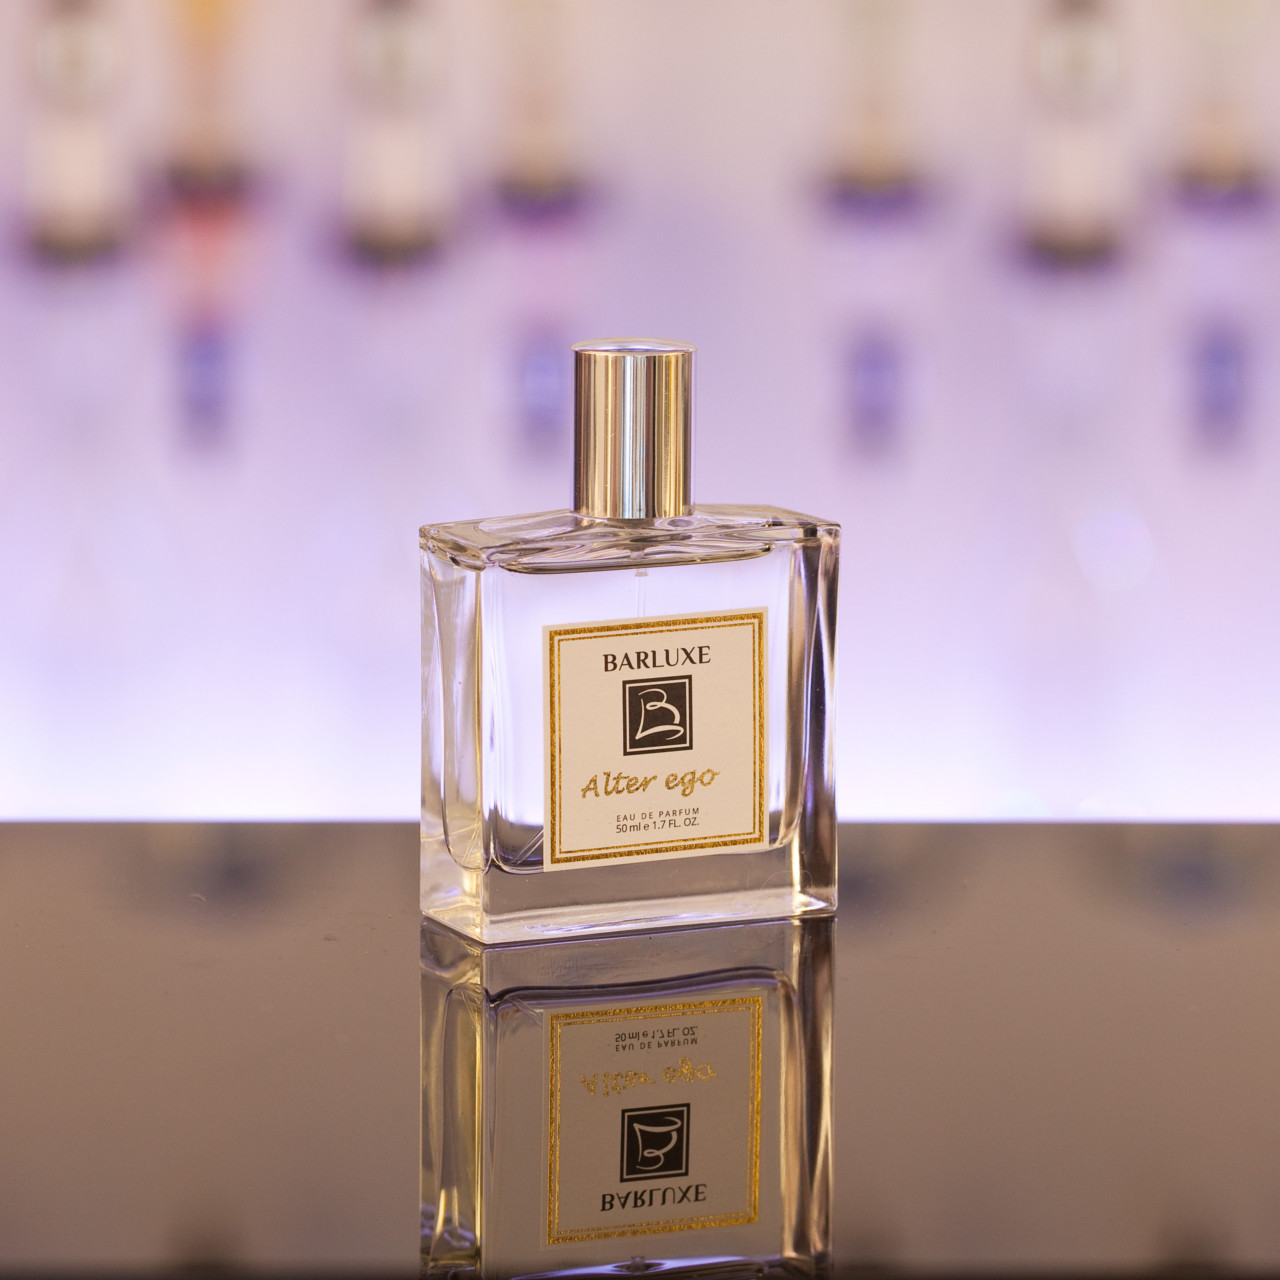 herren-parfum-dupe-double-duft-duftzwilling-alter-ego-2